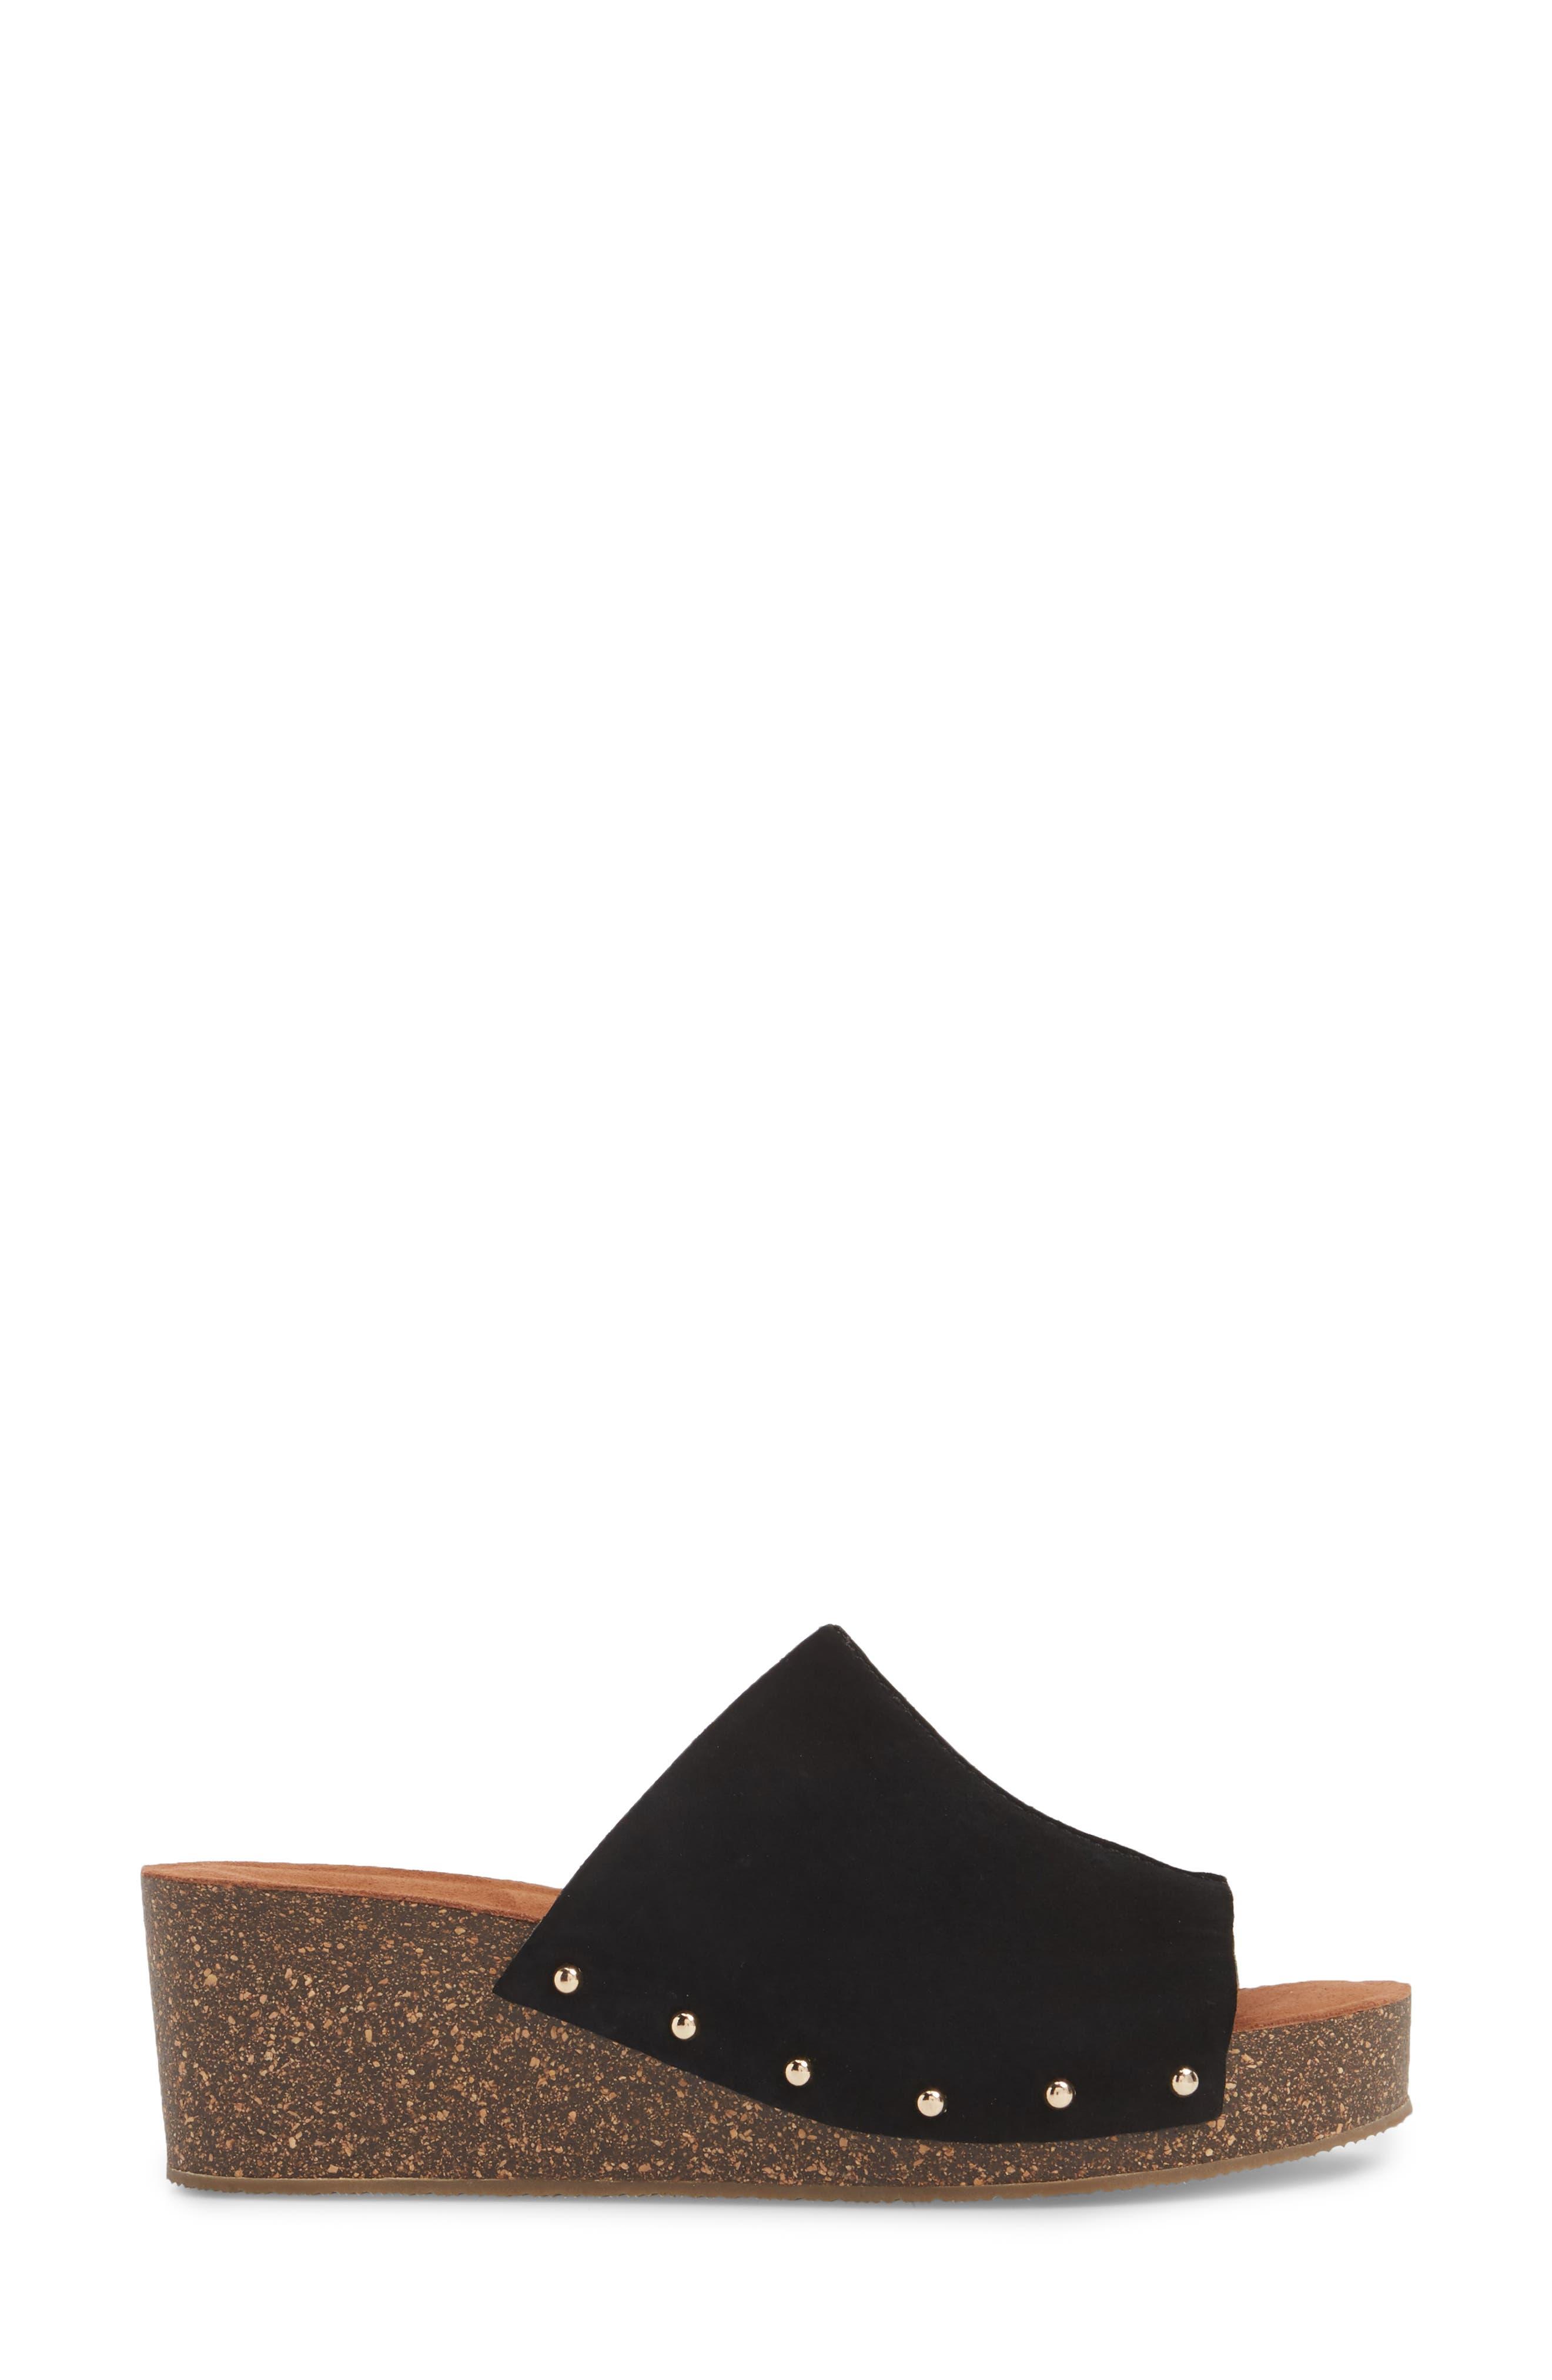 Pavia Wedge Mule,                             Alternate thumbnail 3, color,                             Black Leather